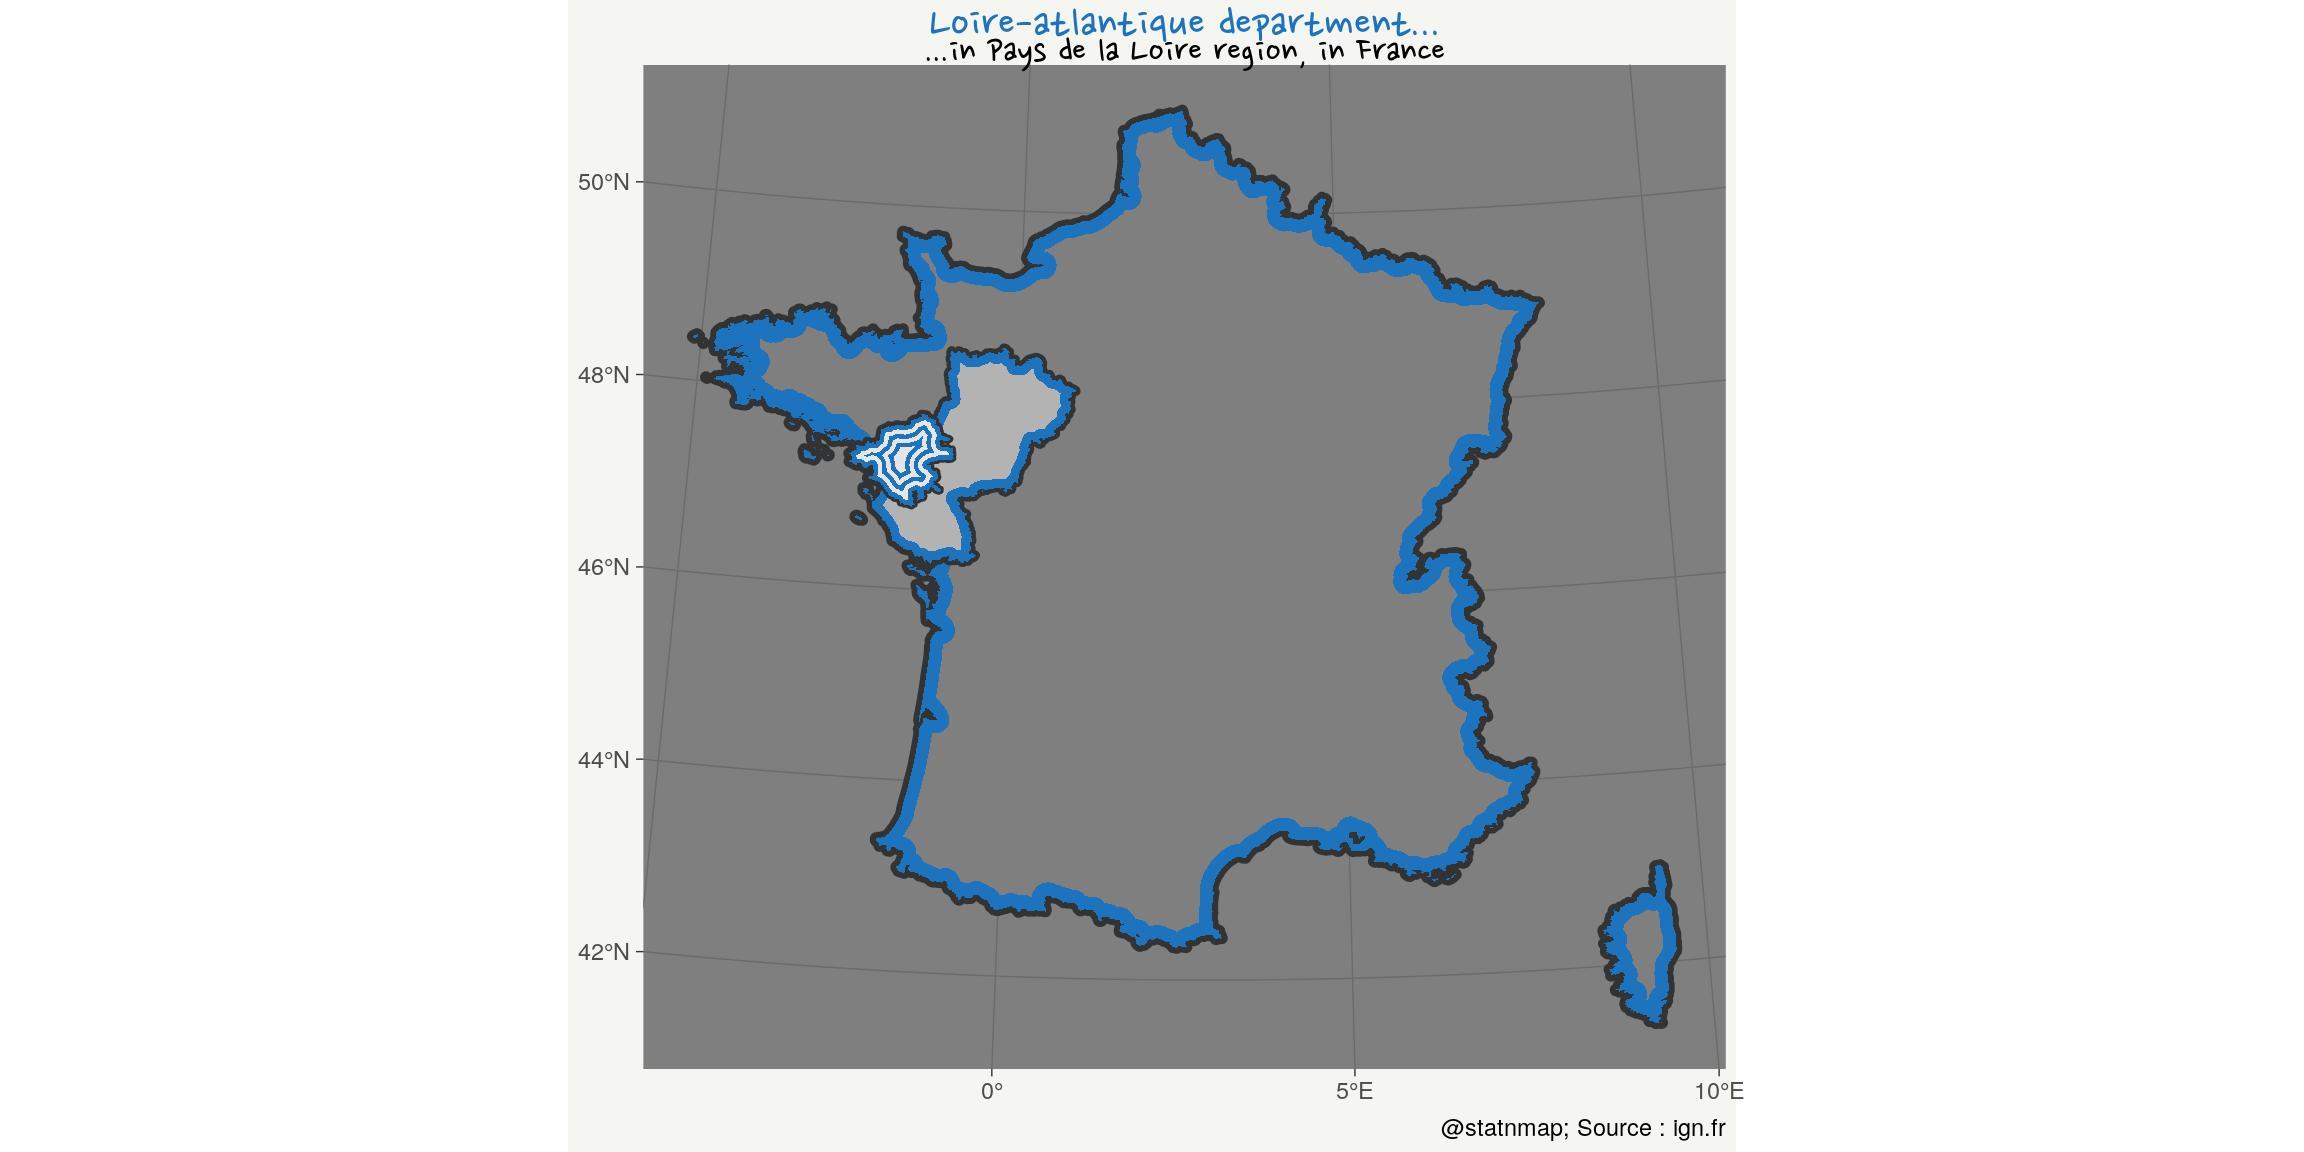 30DayMapChallenge: 30 days building maps (1) - ggplot2